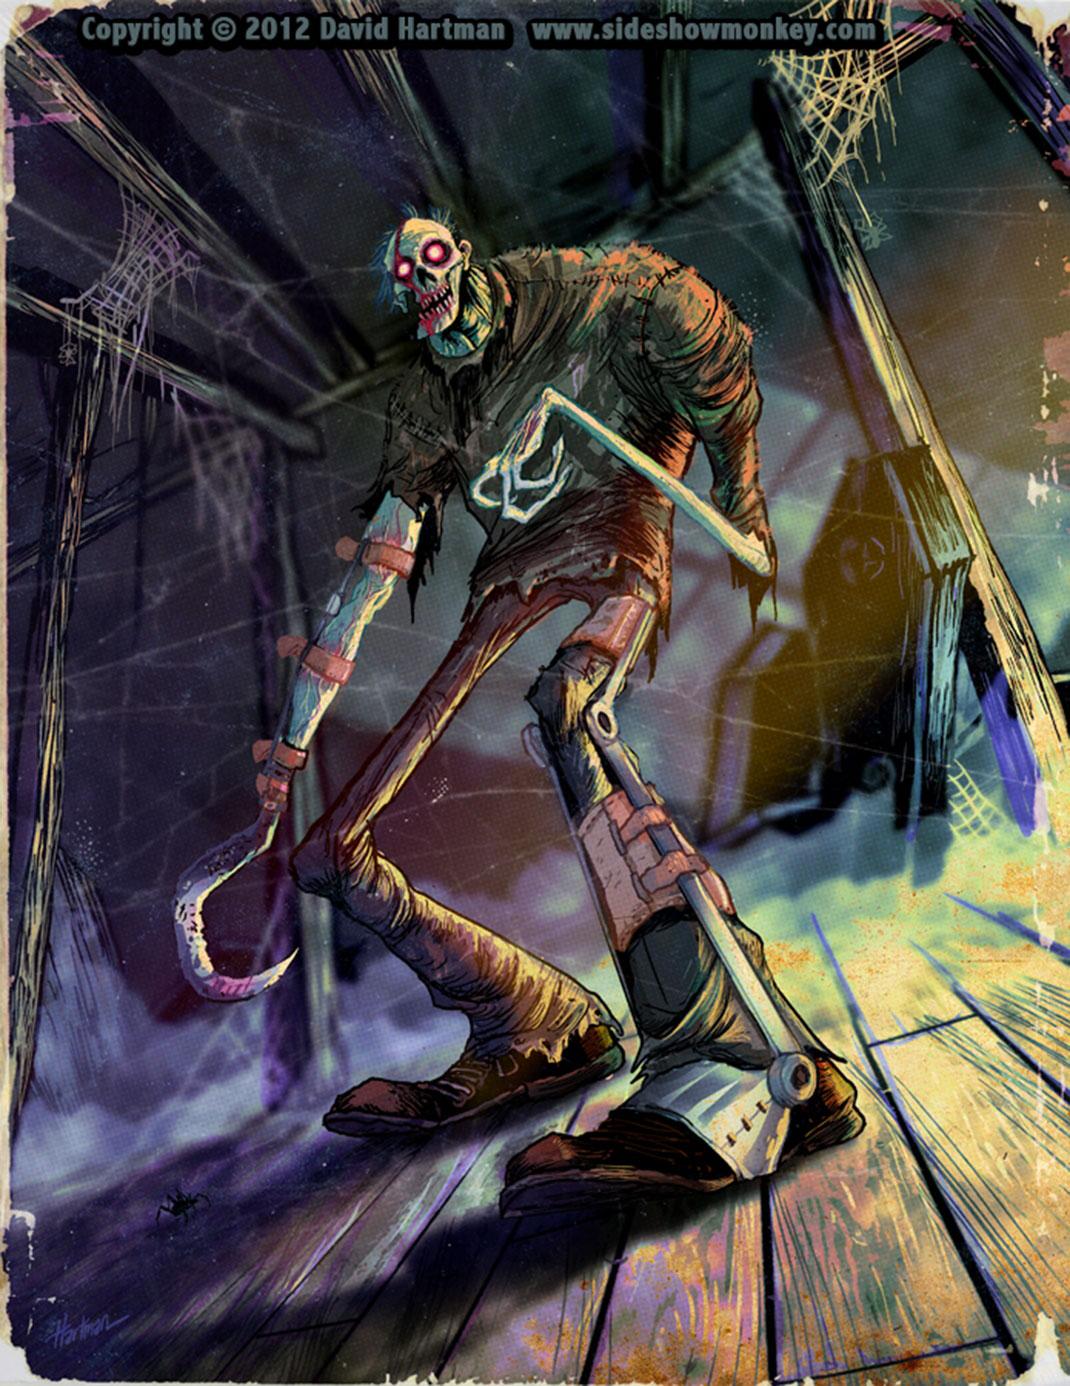 attic_dead_by_hartman_by_sideshowmonkey-d5otgmf